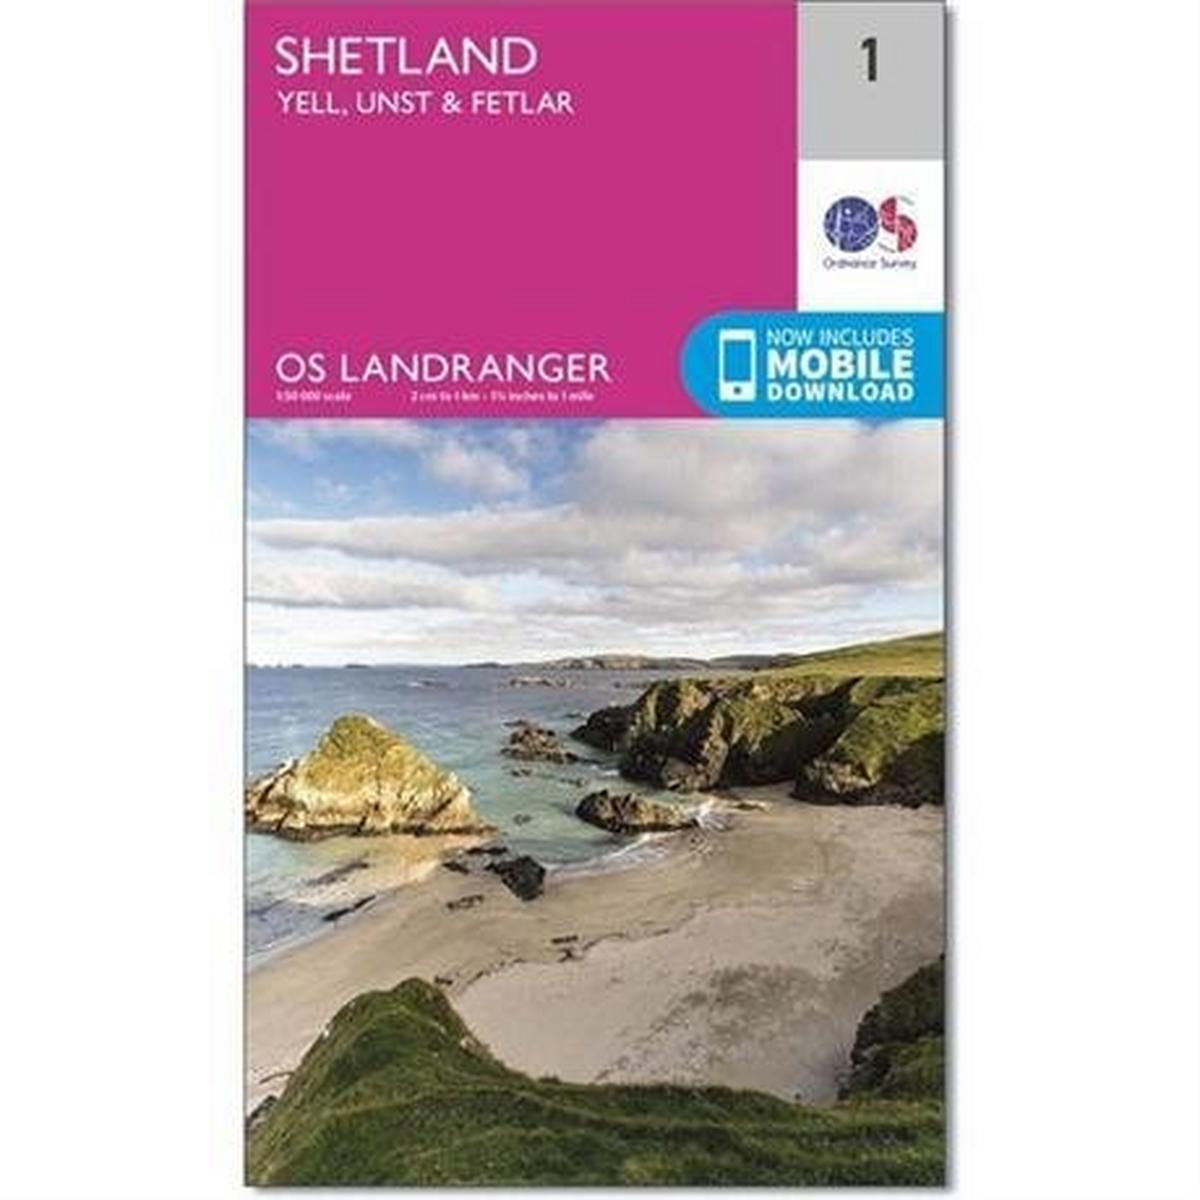 Ordnance Survey OS Landranger Map 01 Shetland - Yell, Unst and Fetlar